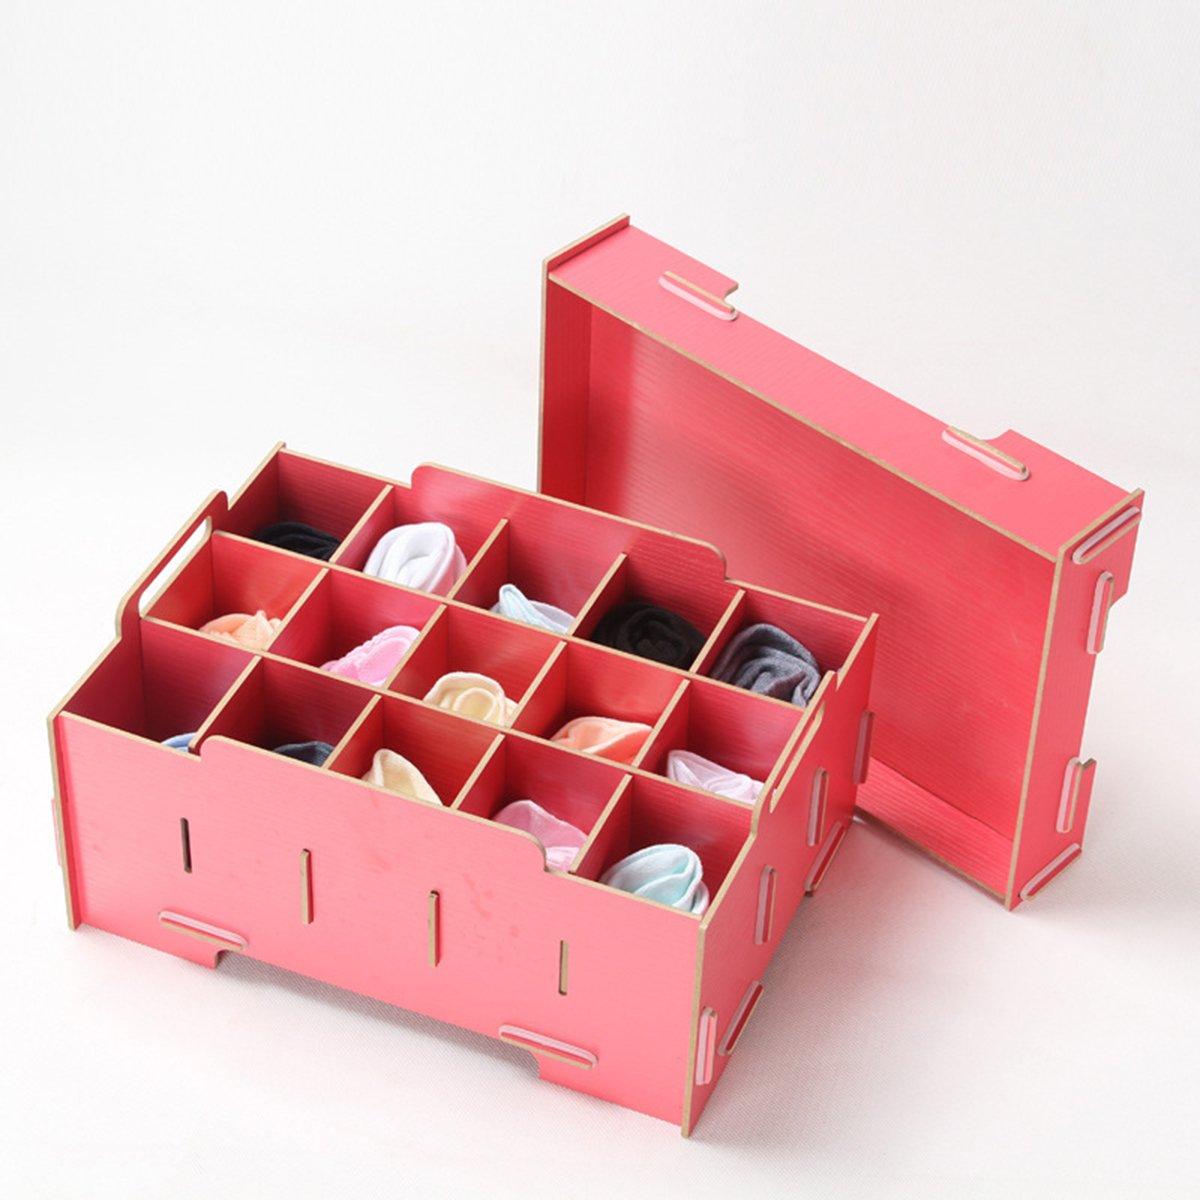 Organizer Multifunctiona Storage Box, Underwear Socks Panties Bra Wood Box Red